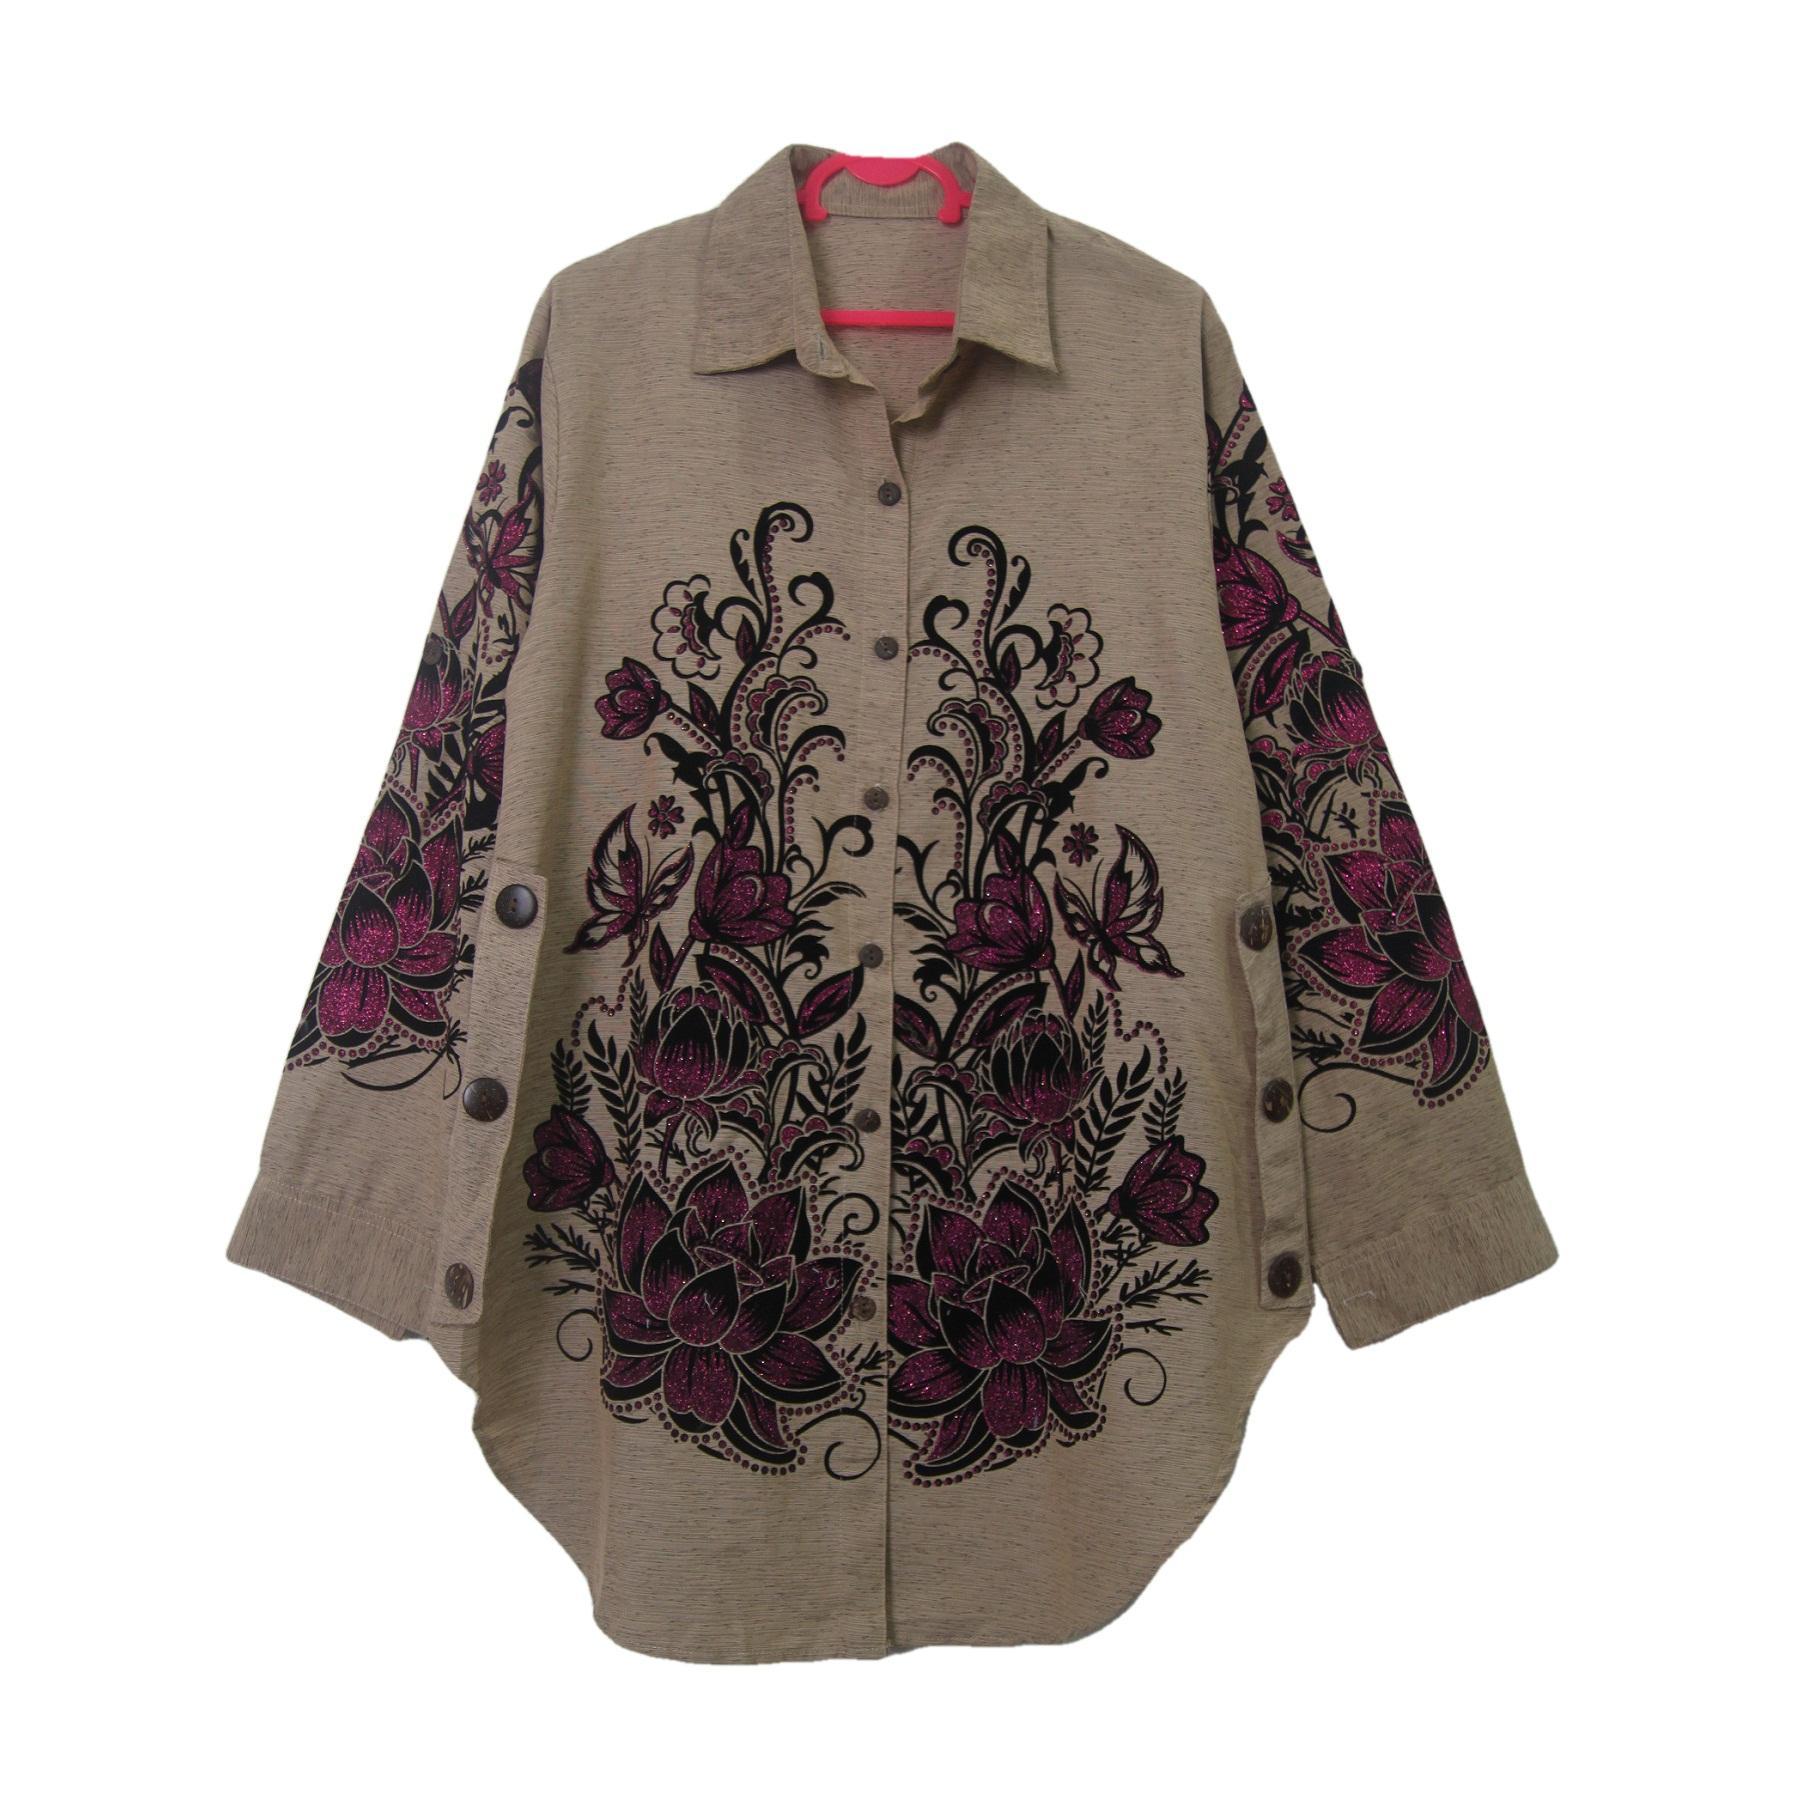 Jual Baju Top Blouse Model Casual Motif Bunga Blue Pink Style Impor Atasan Blink